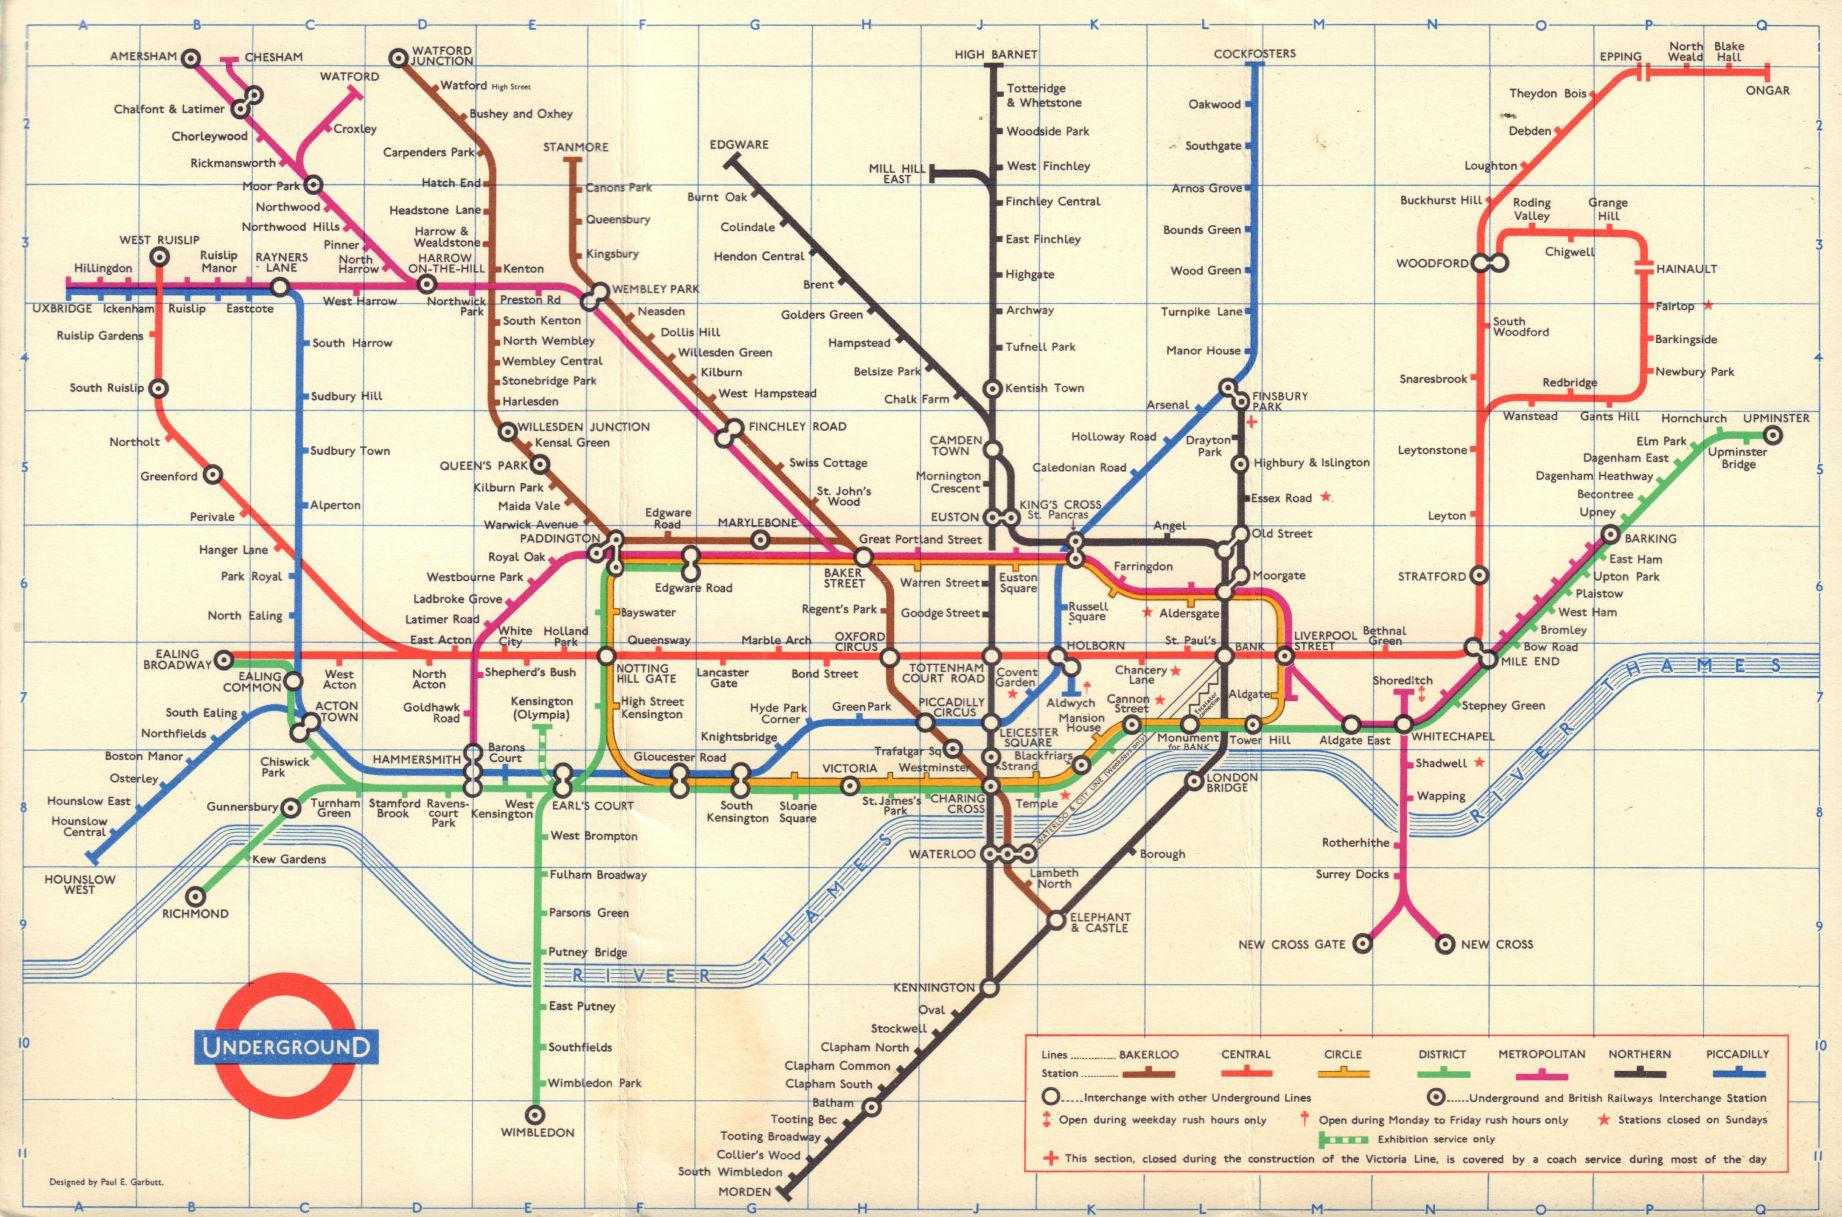 LONDON UNDERGROUND diagram of lines tube map. Ongar. Essex Rd. GARBUTT 1965